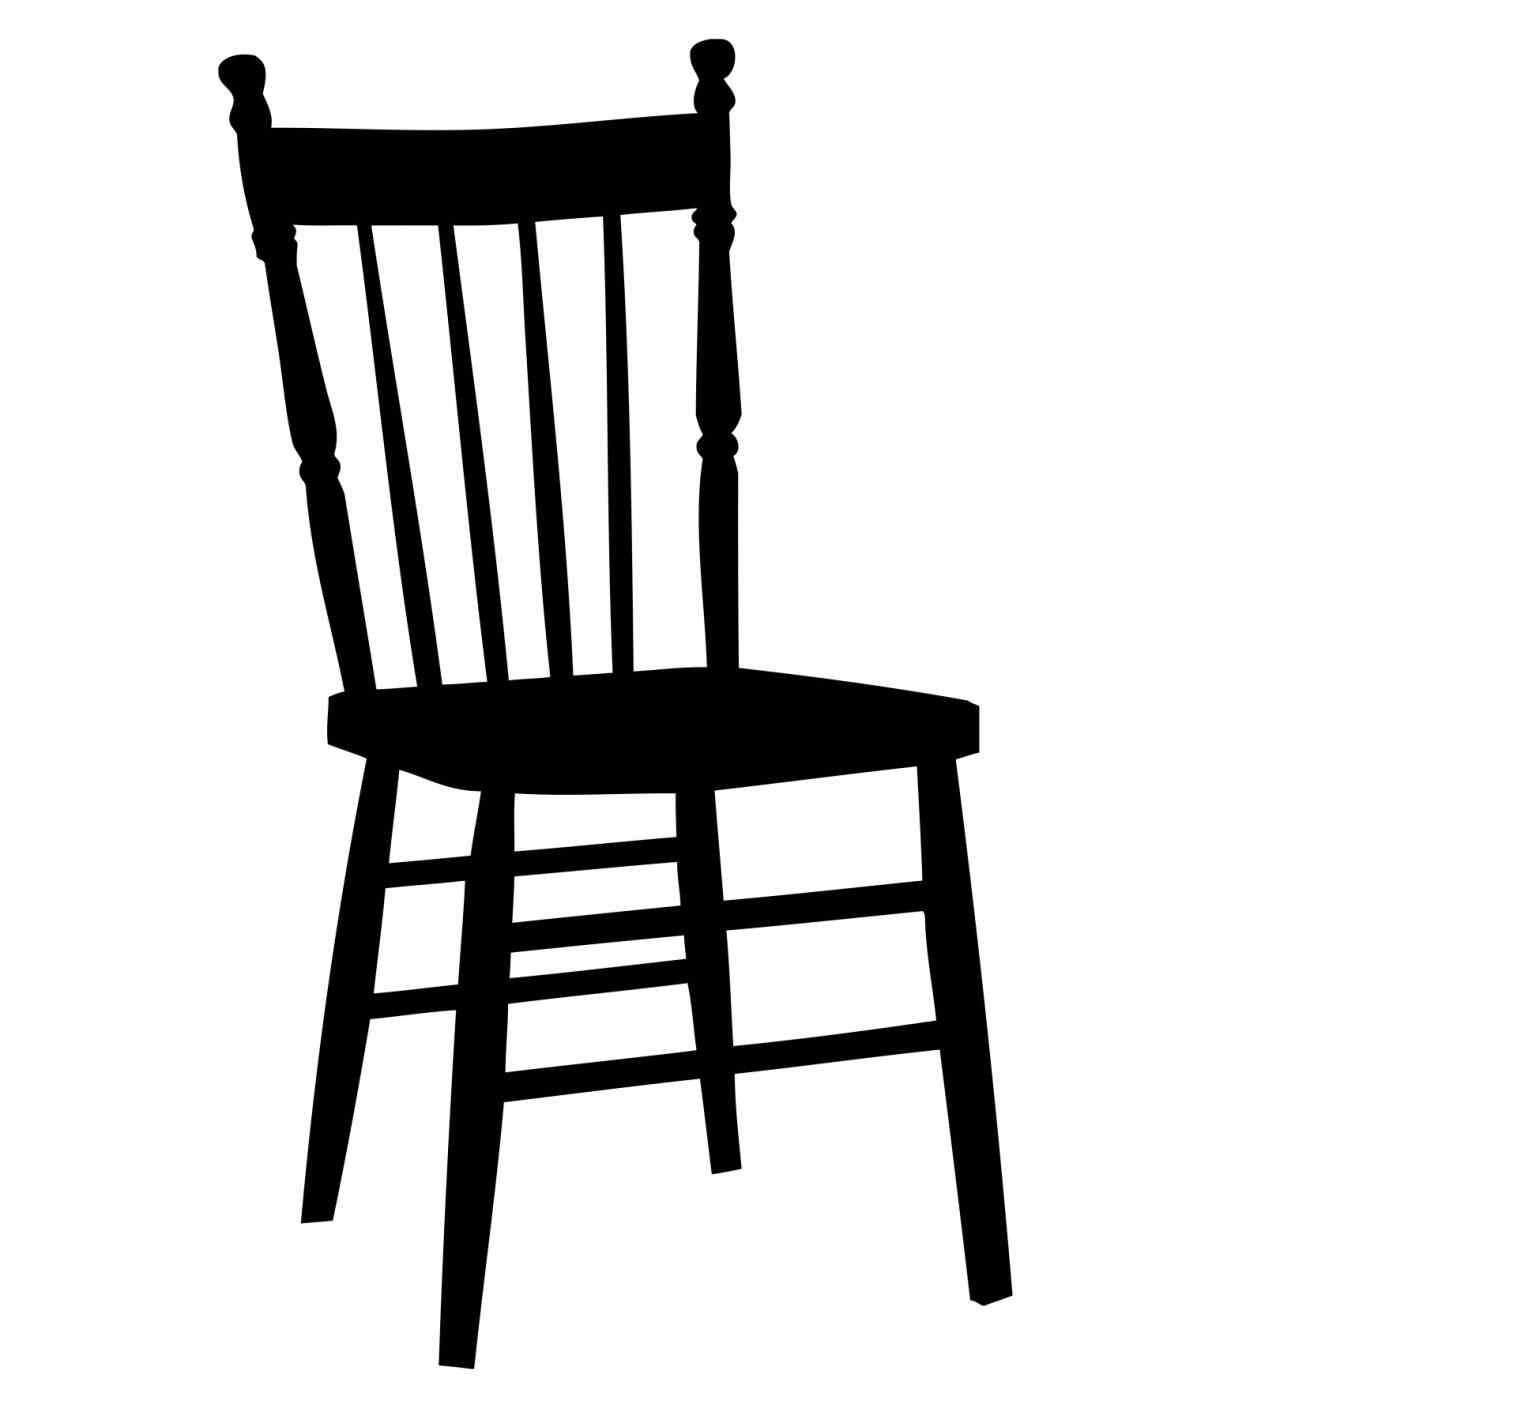 Rocking Chair Clipart